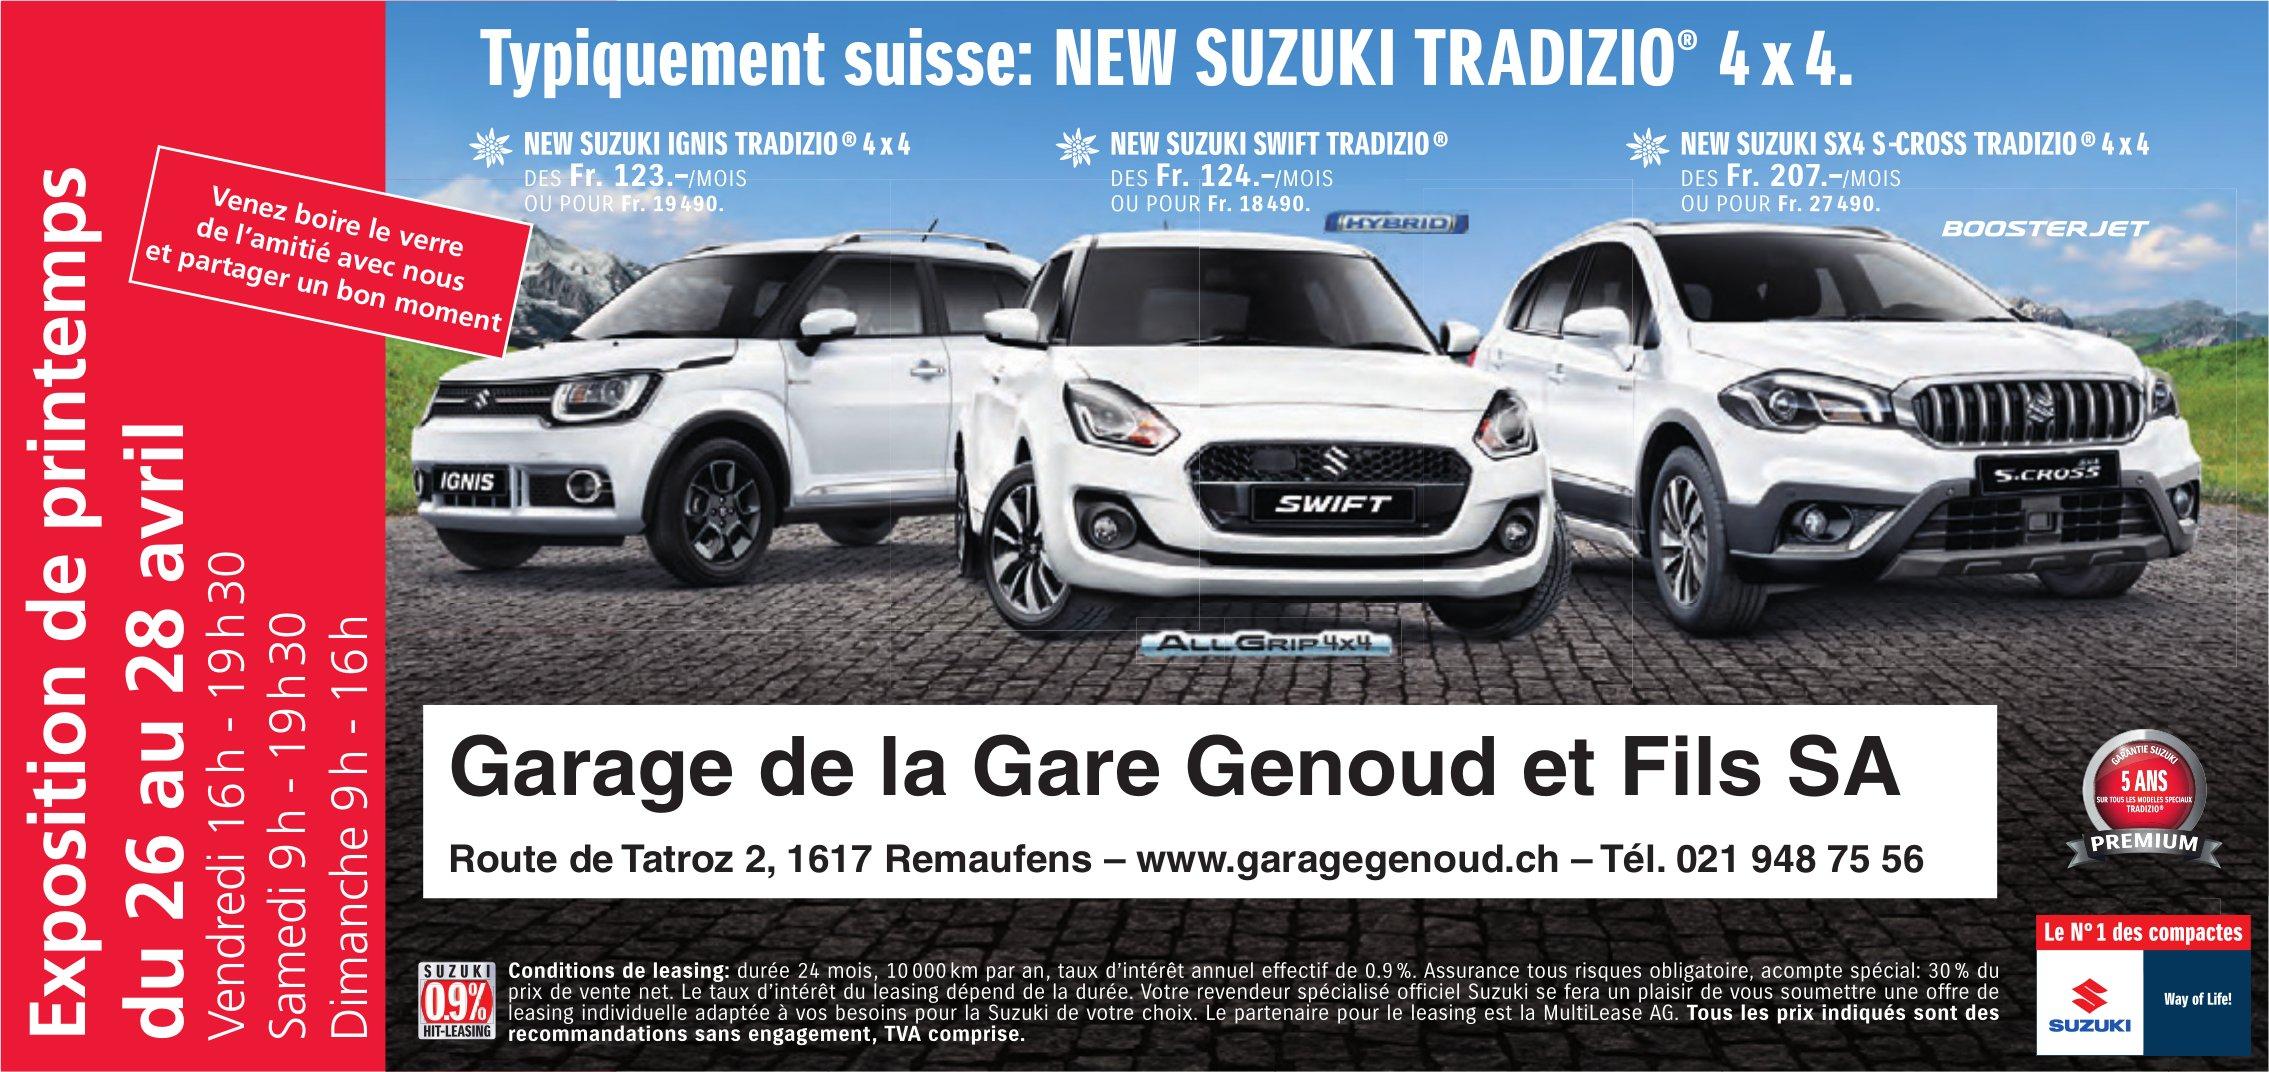 Garage de la Gare Genoud et Fils SA, Remaufens, Typiquement Suisse: New suzuki